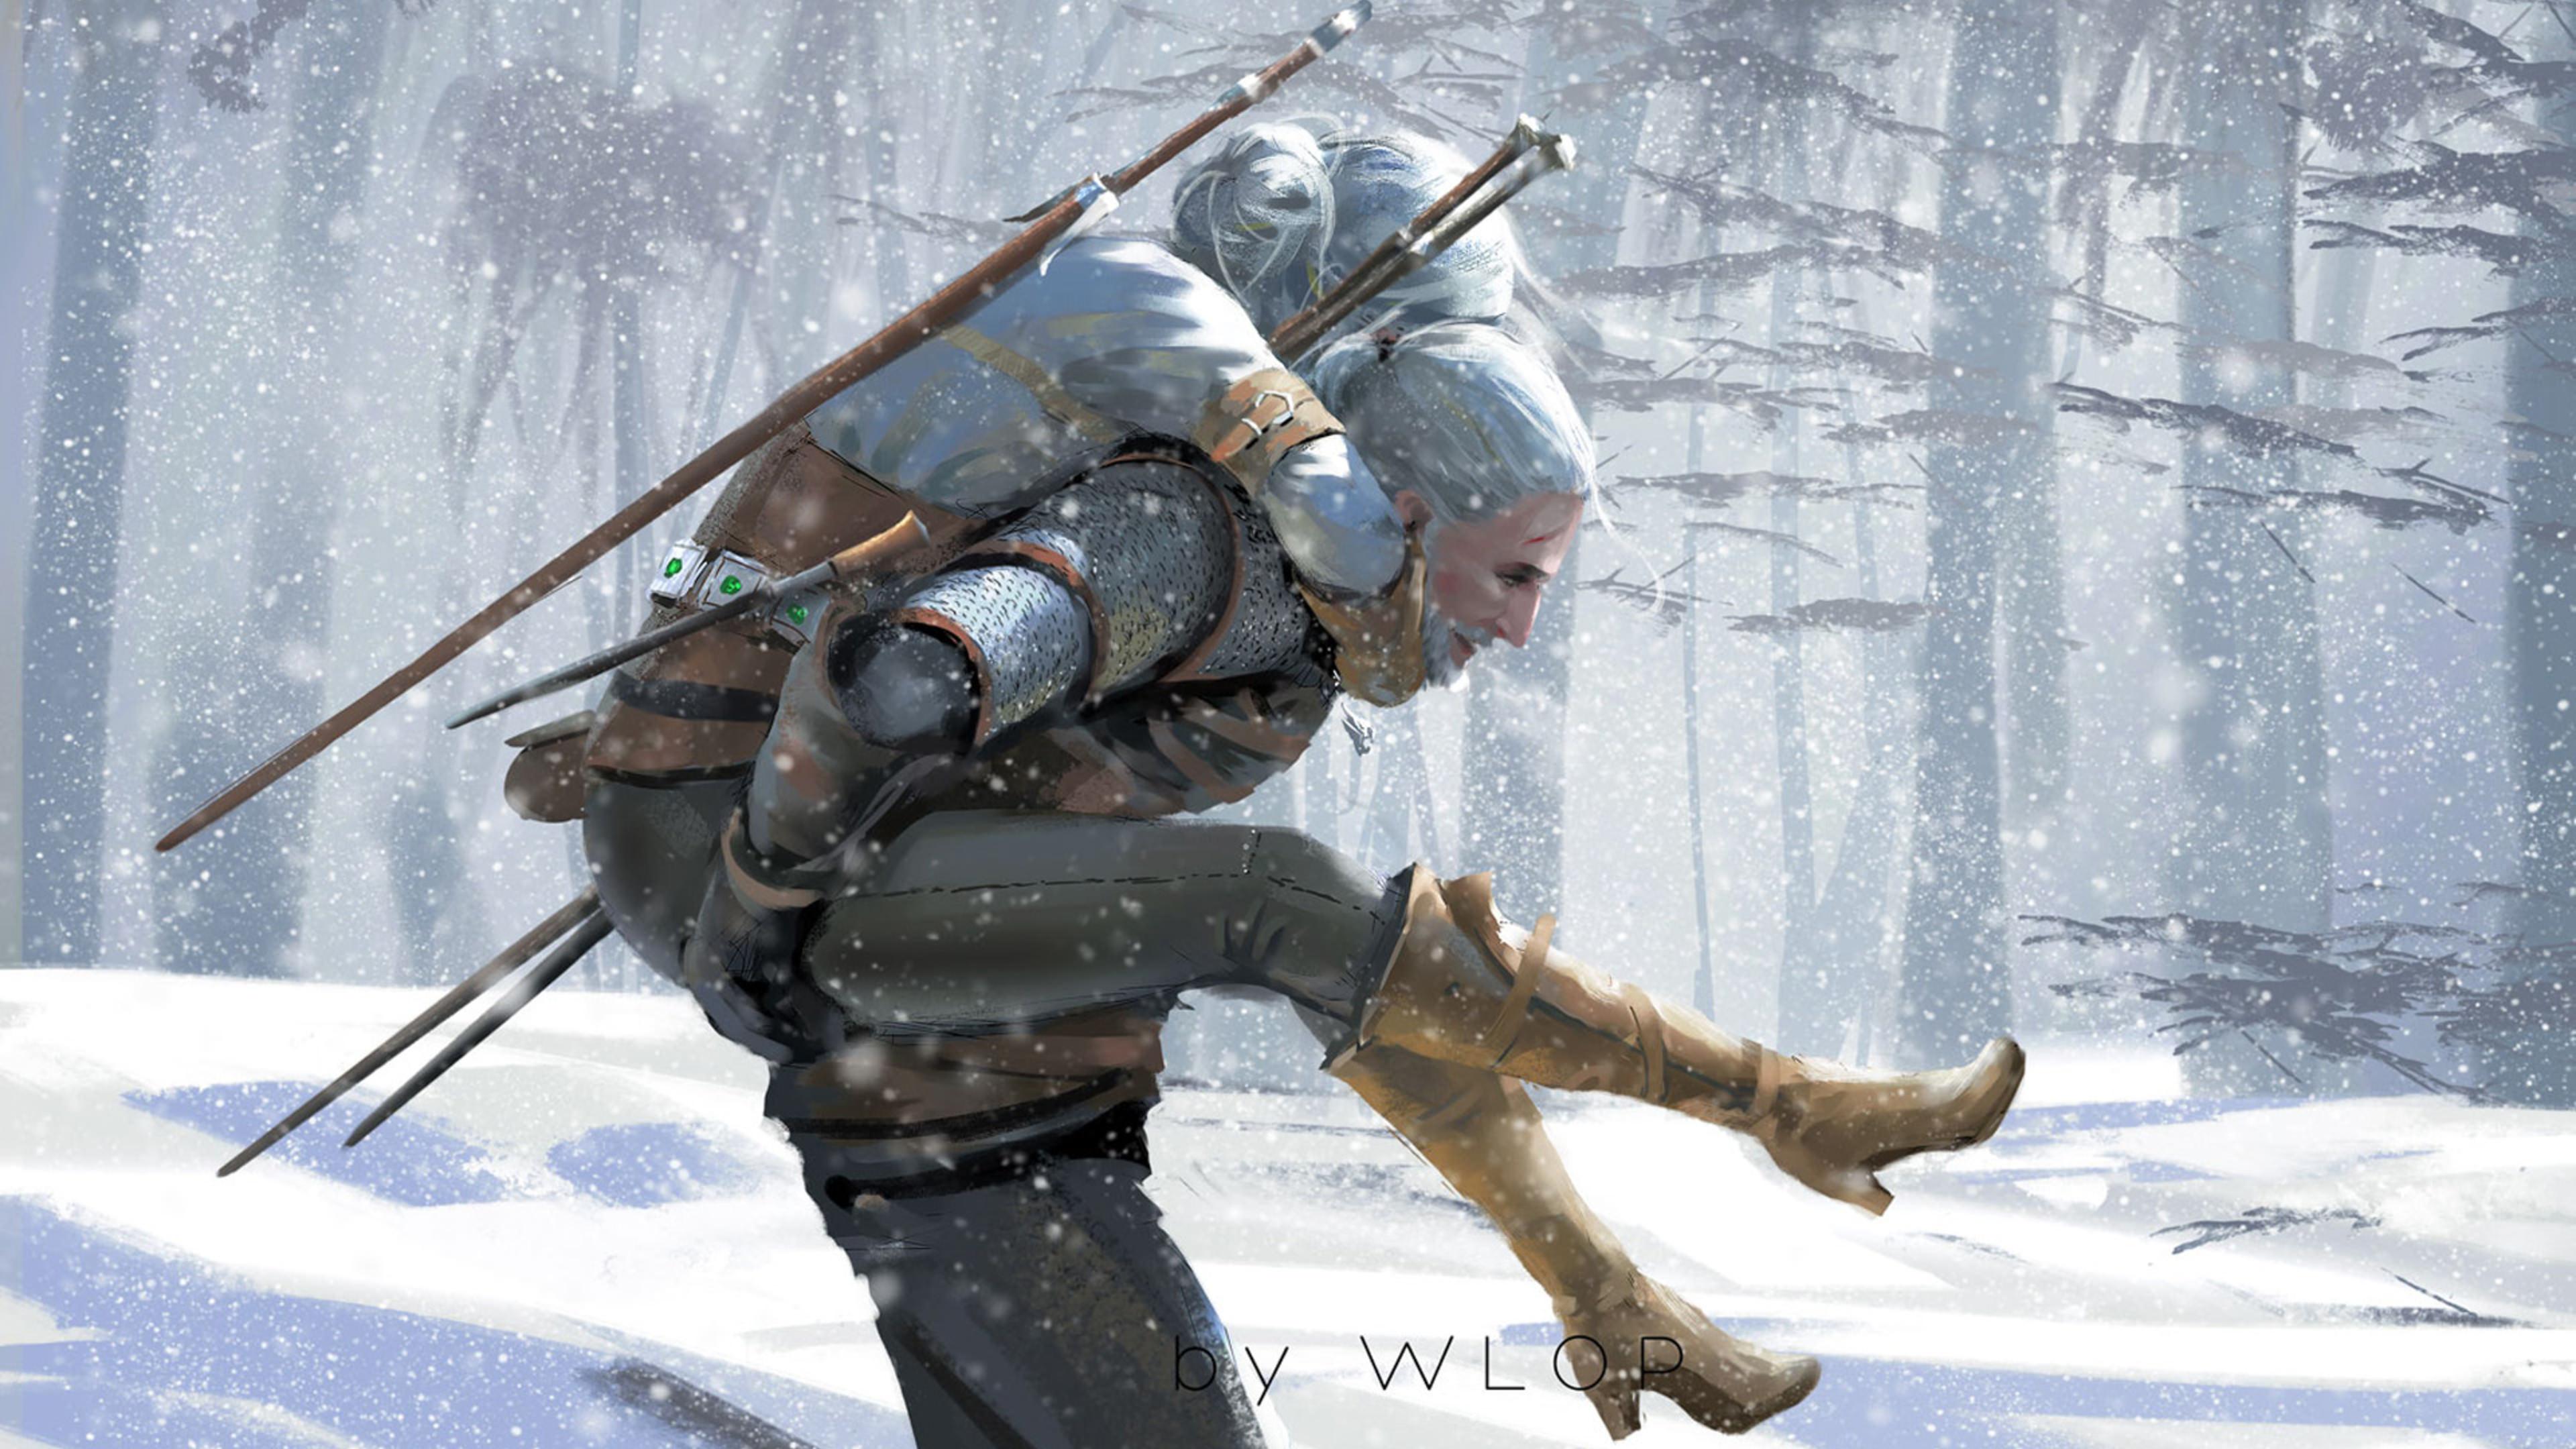 General 3840x2160 WLOP The Witcher video games Geralt of Rivia snow white hair artwork digital art men women trees piggyback Cirilla Fiona Elen Riannon